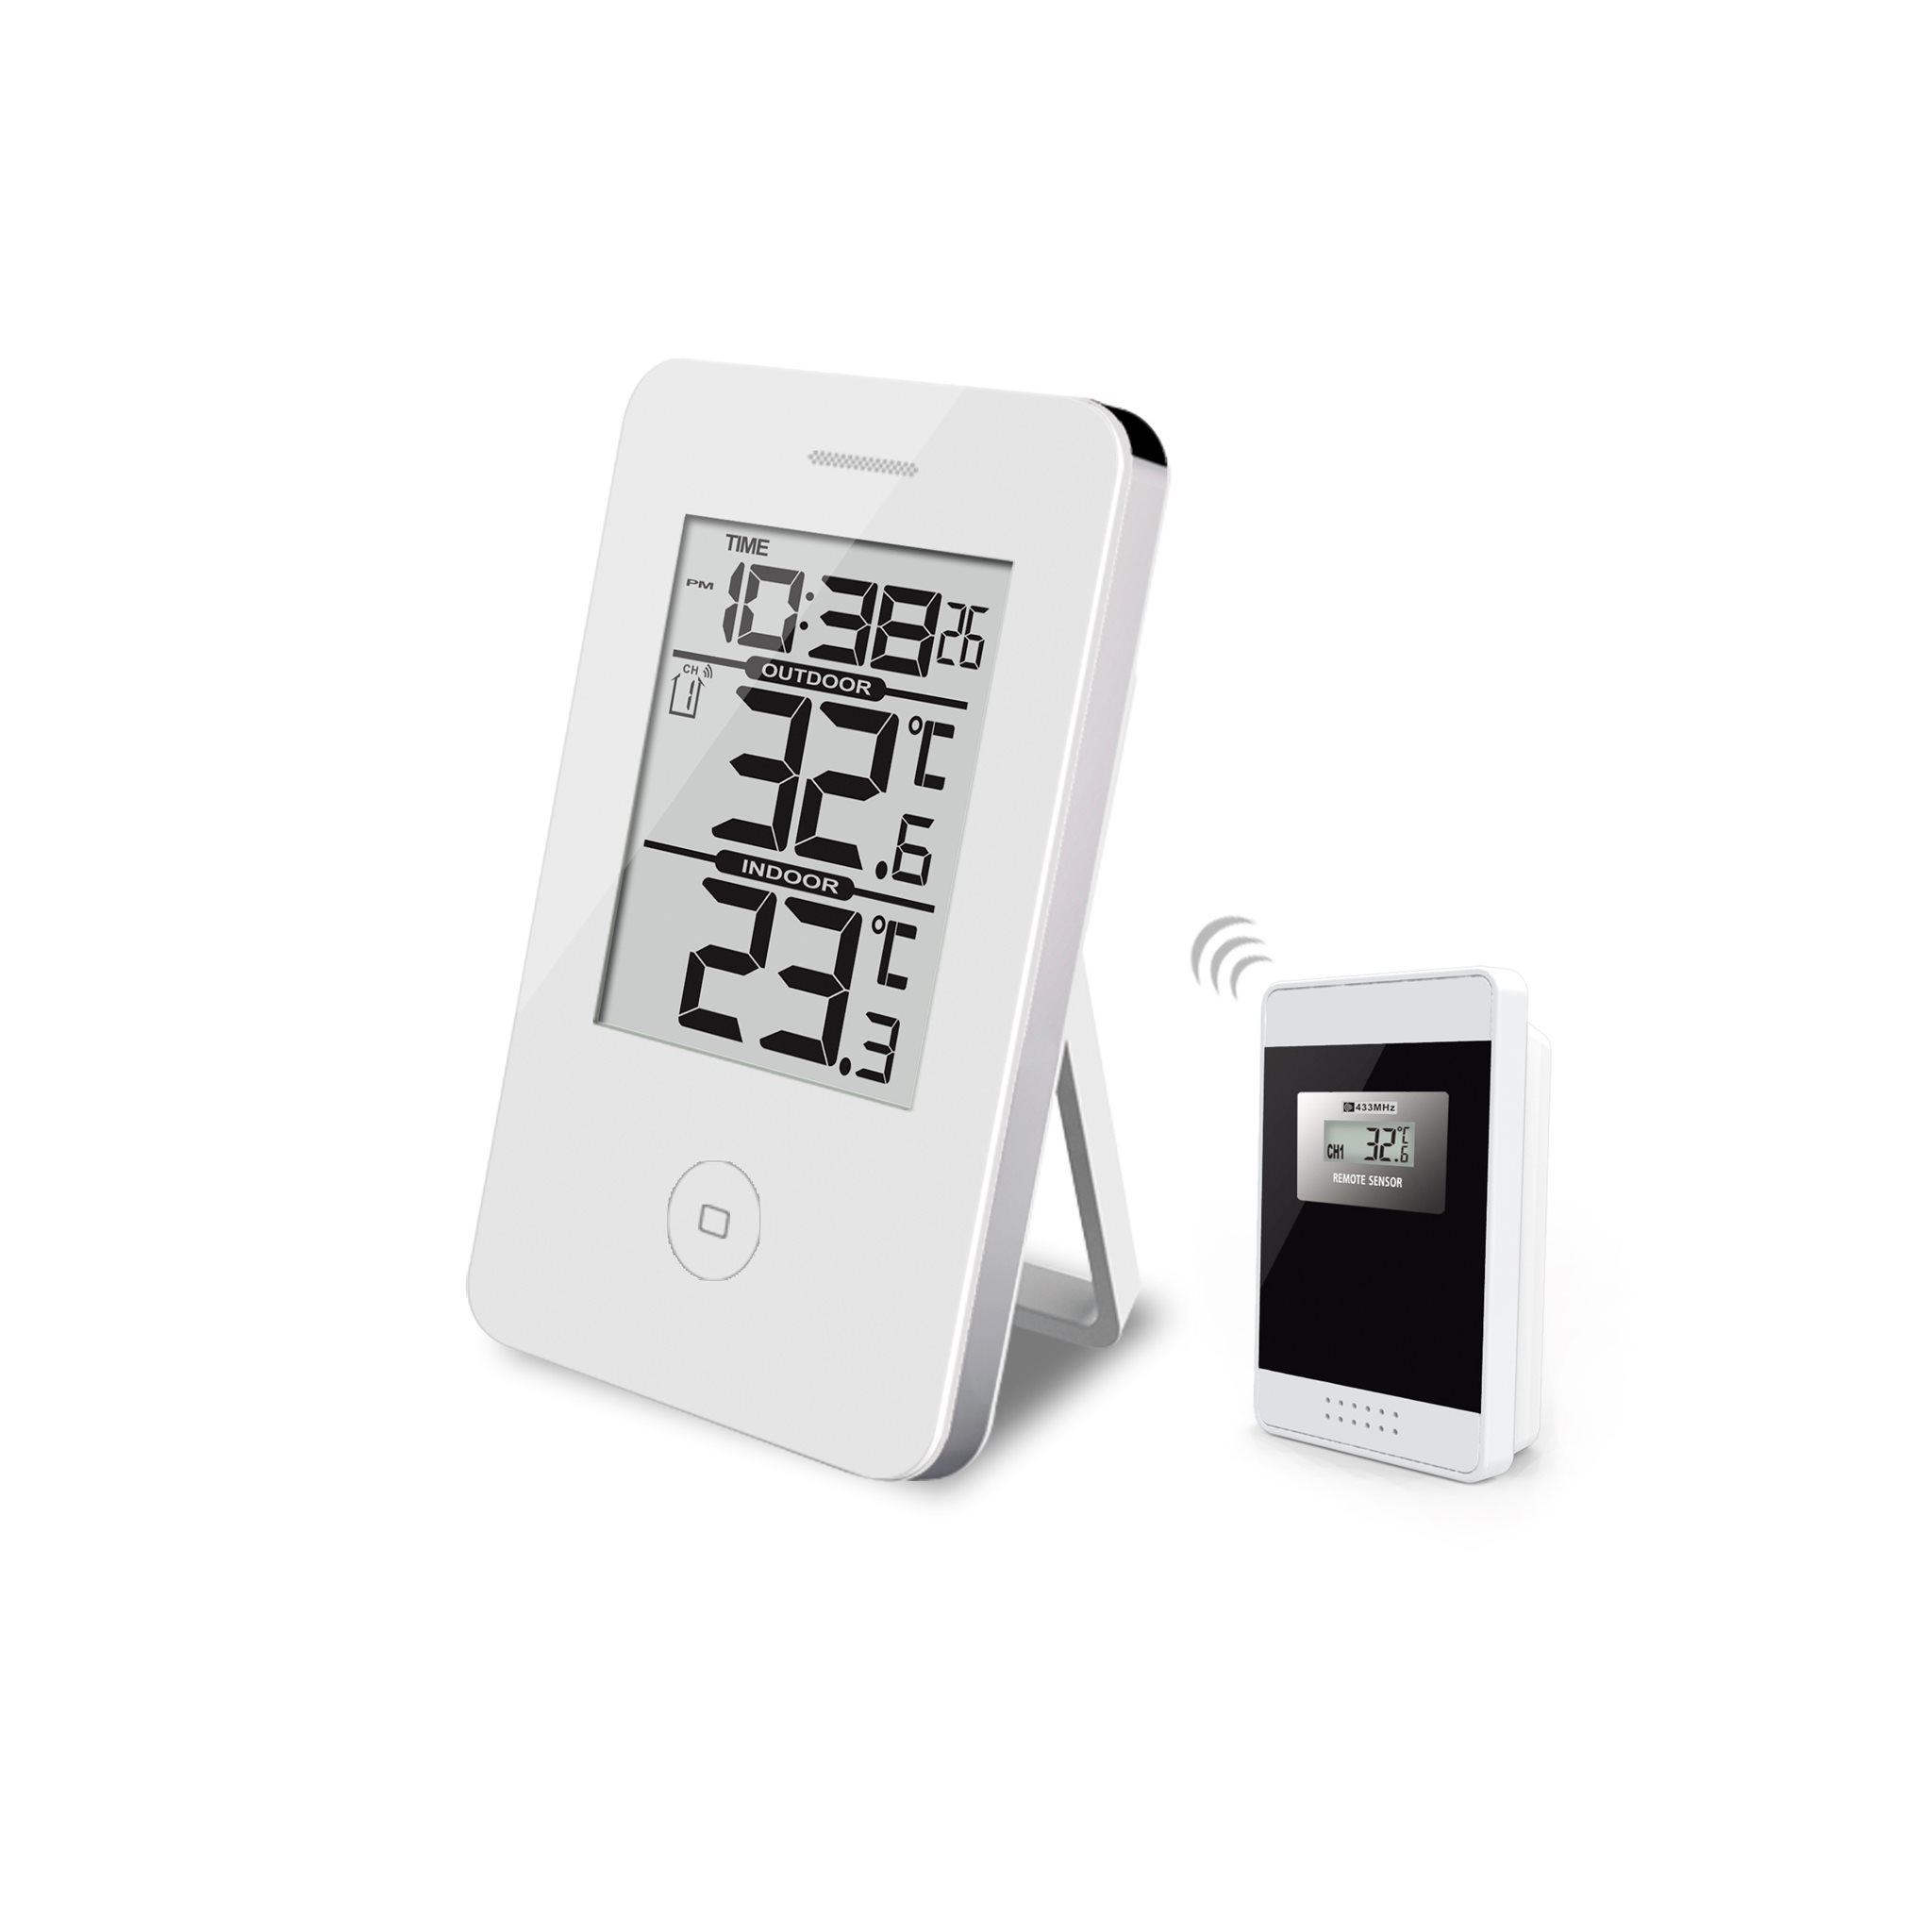 TERMOMETERFABRIKEN Termometer .. (336300385) ᐈ digitalwarehouse på ... 700d1ff9ebefb